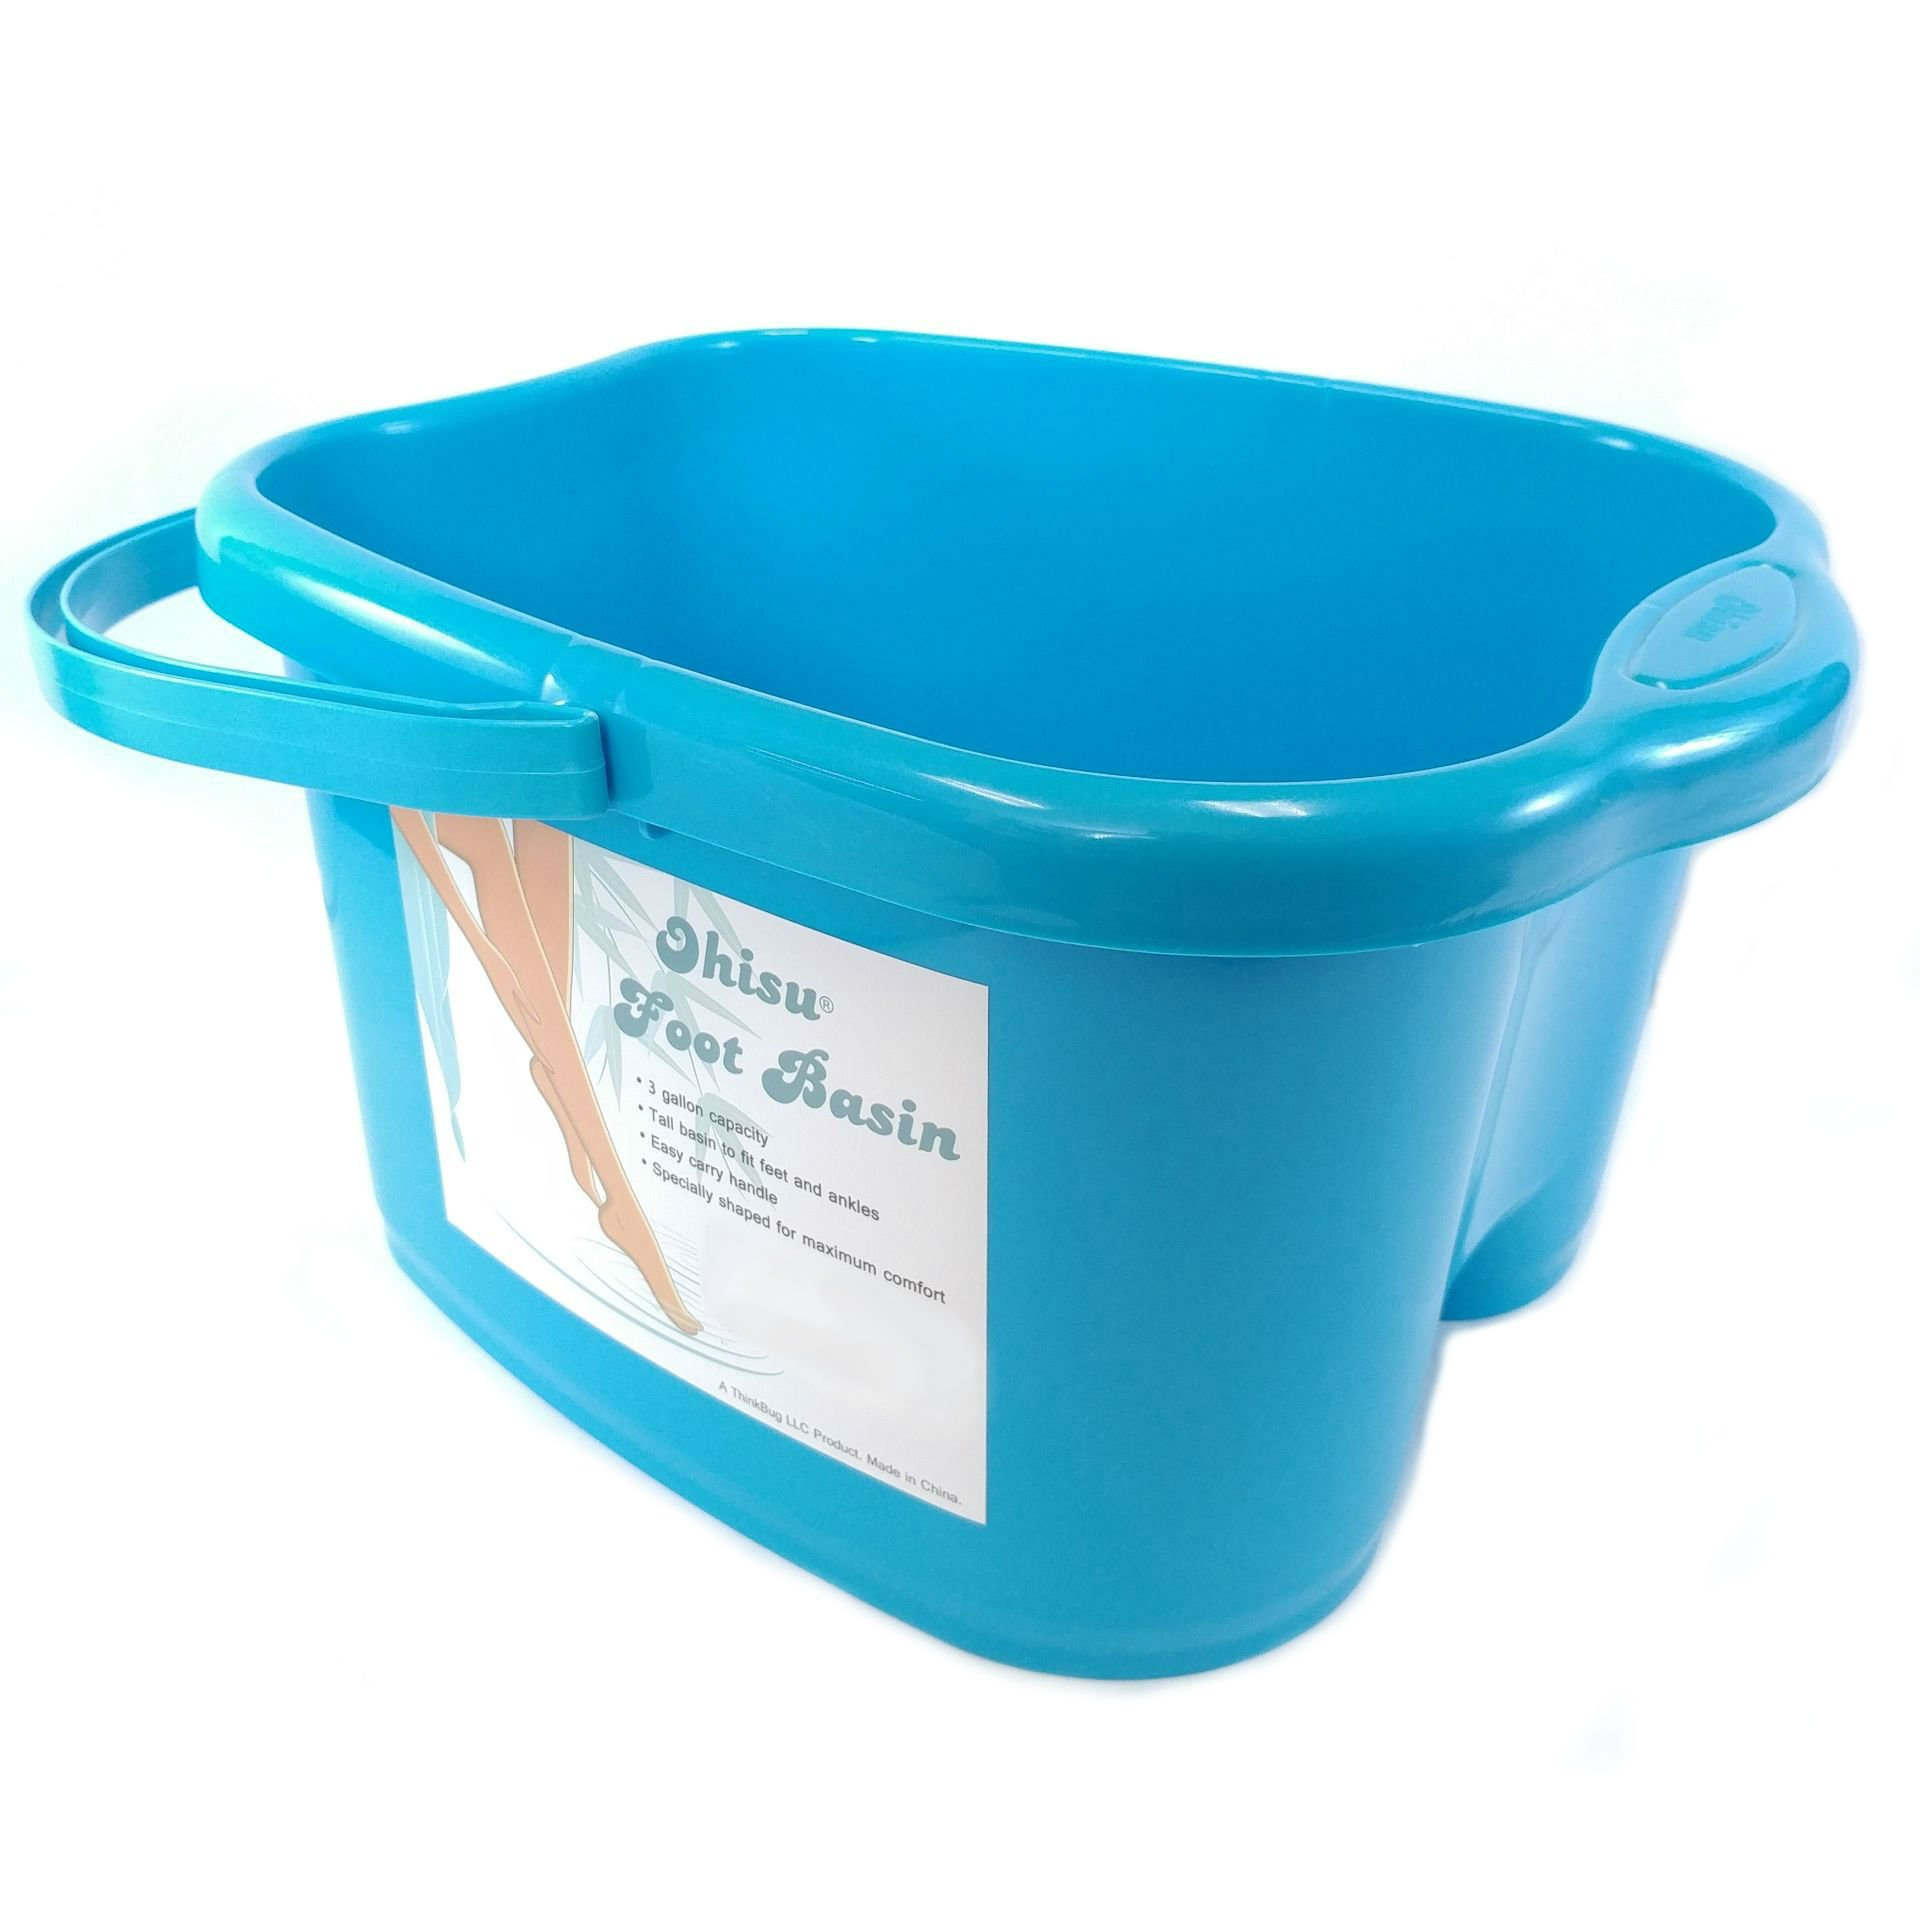 Ohisu Blue Foot Basin for Foot Bath, Soak, or Detox by Ohisu (Image #3)